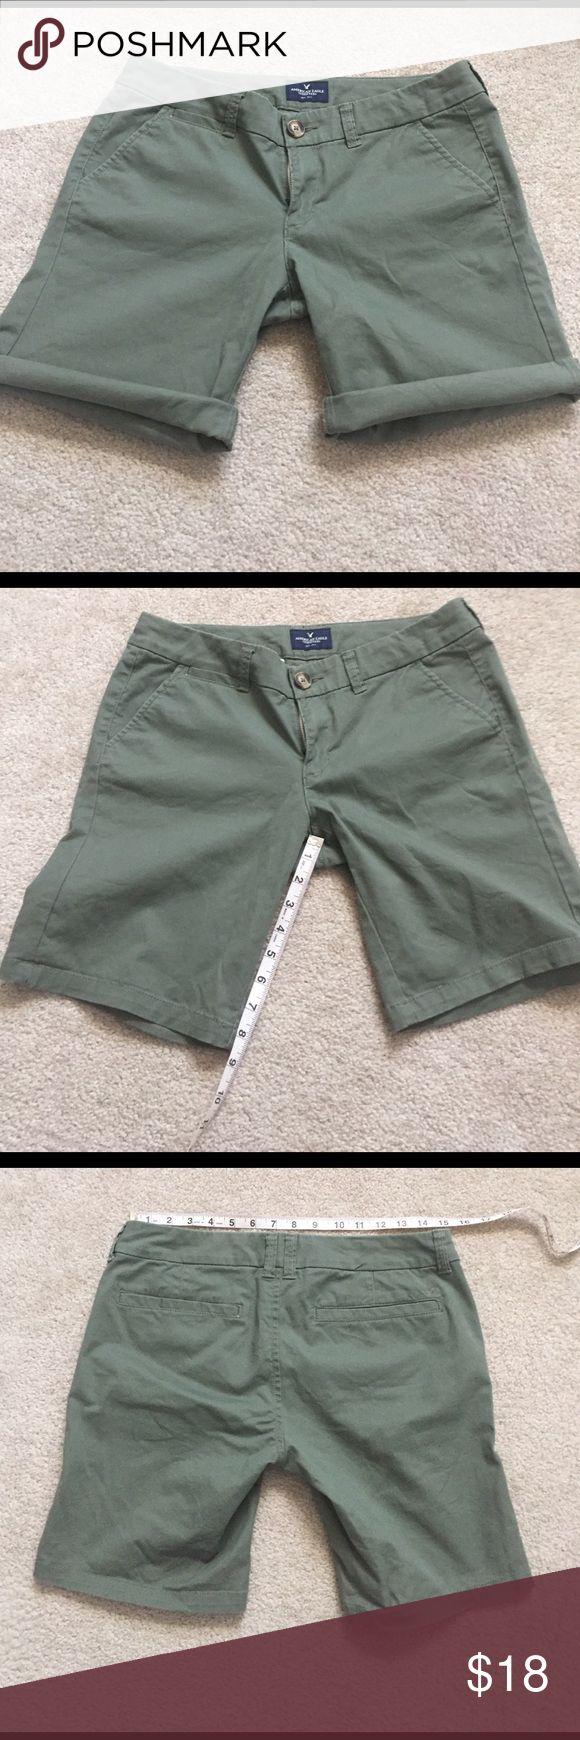 American Eagle Army Green Bermuda Shorts NWOT 6 American Eagle Army Green Bermuda Shorts NWOT 6 American Eagle Outfitters Shorts Bermudas